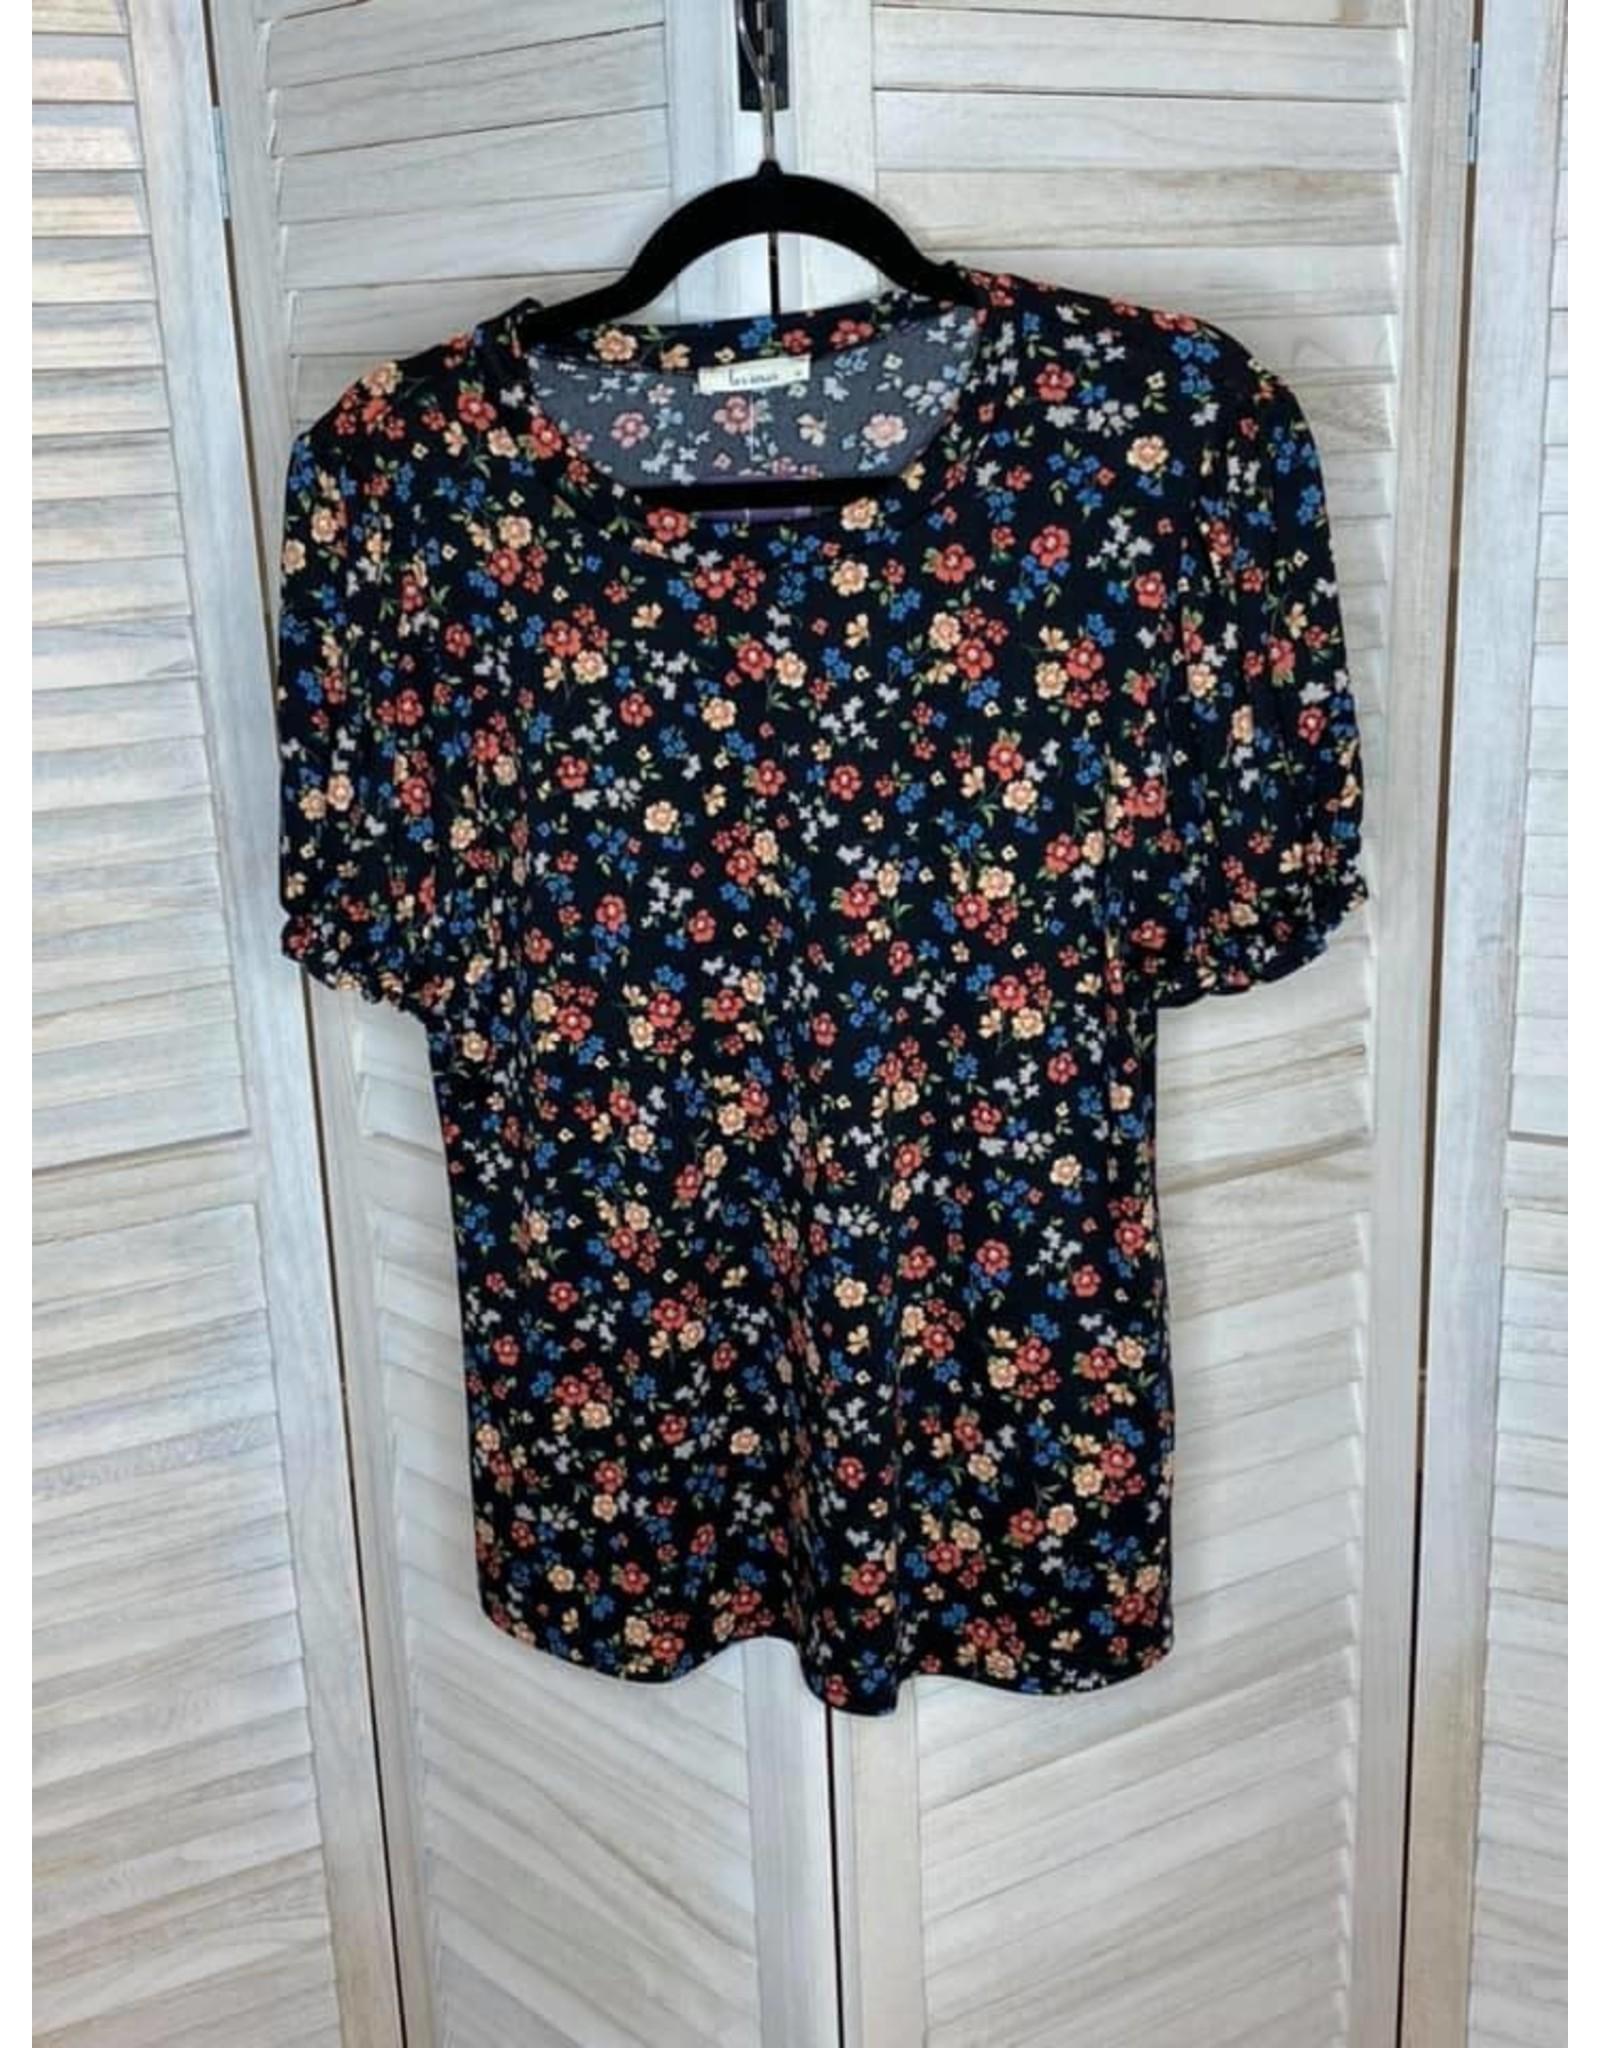 Les Amis Black Floral Short Puff Sleeve Top